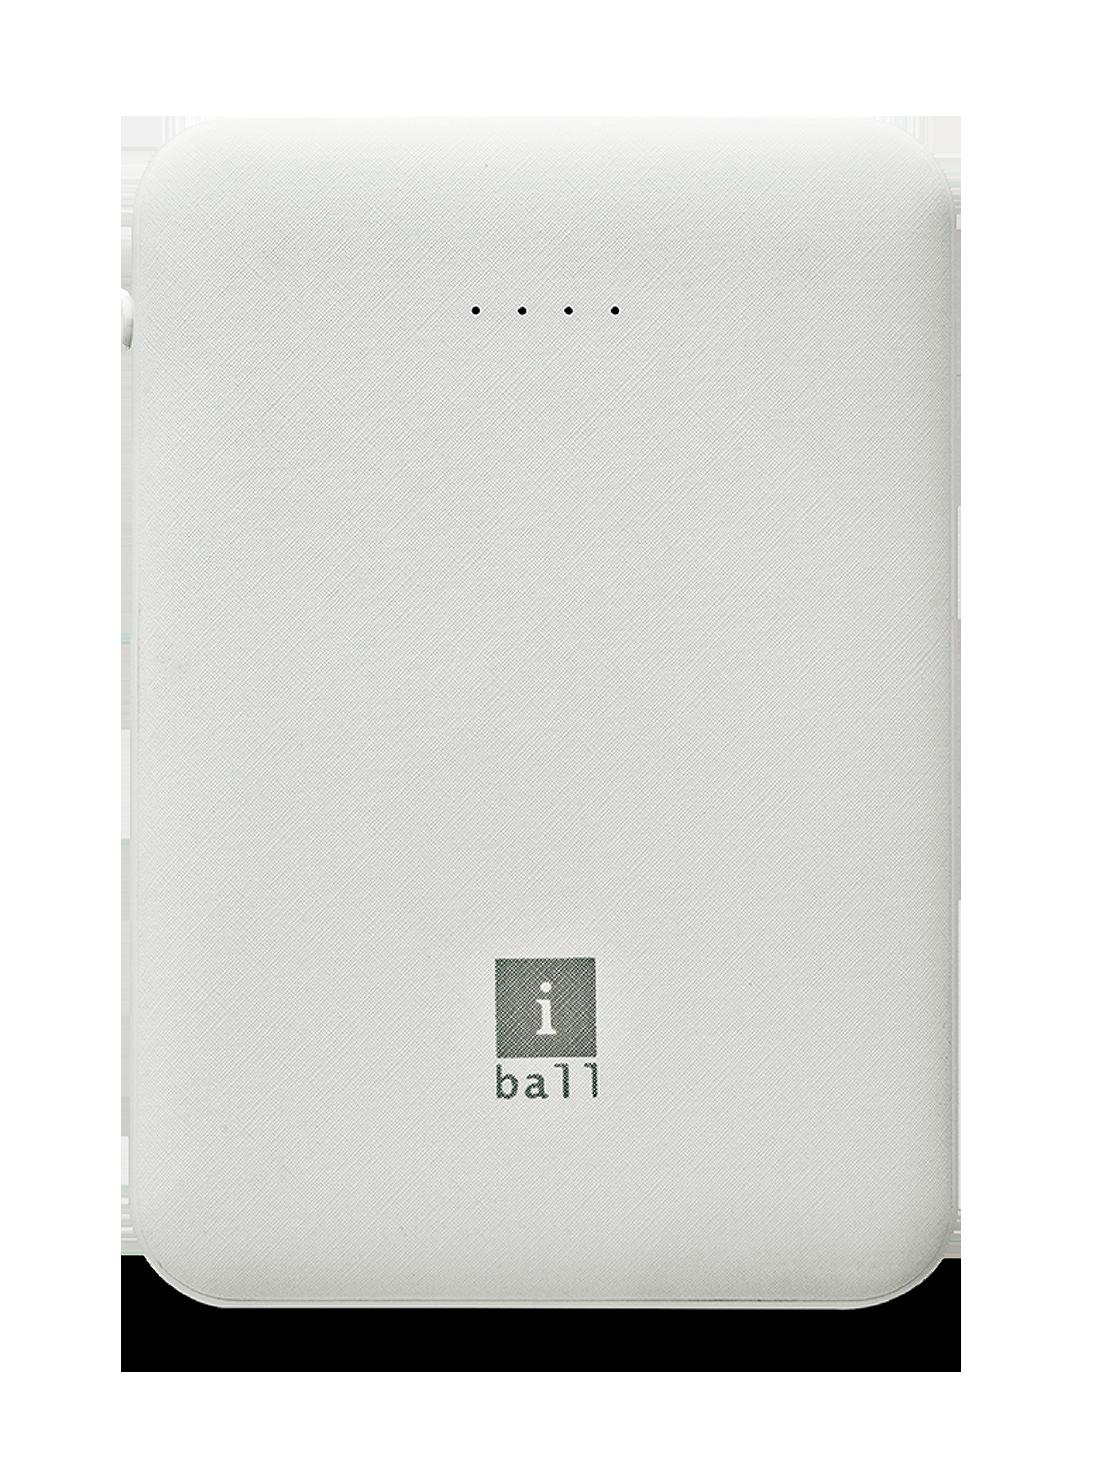 iBall 5000LPS_WHT 5000 mAh Slim Power Bank - White